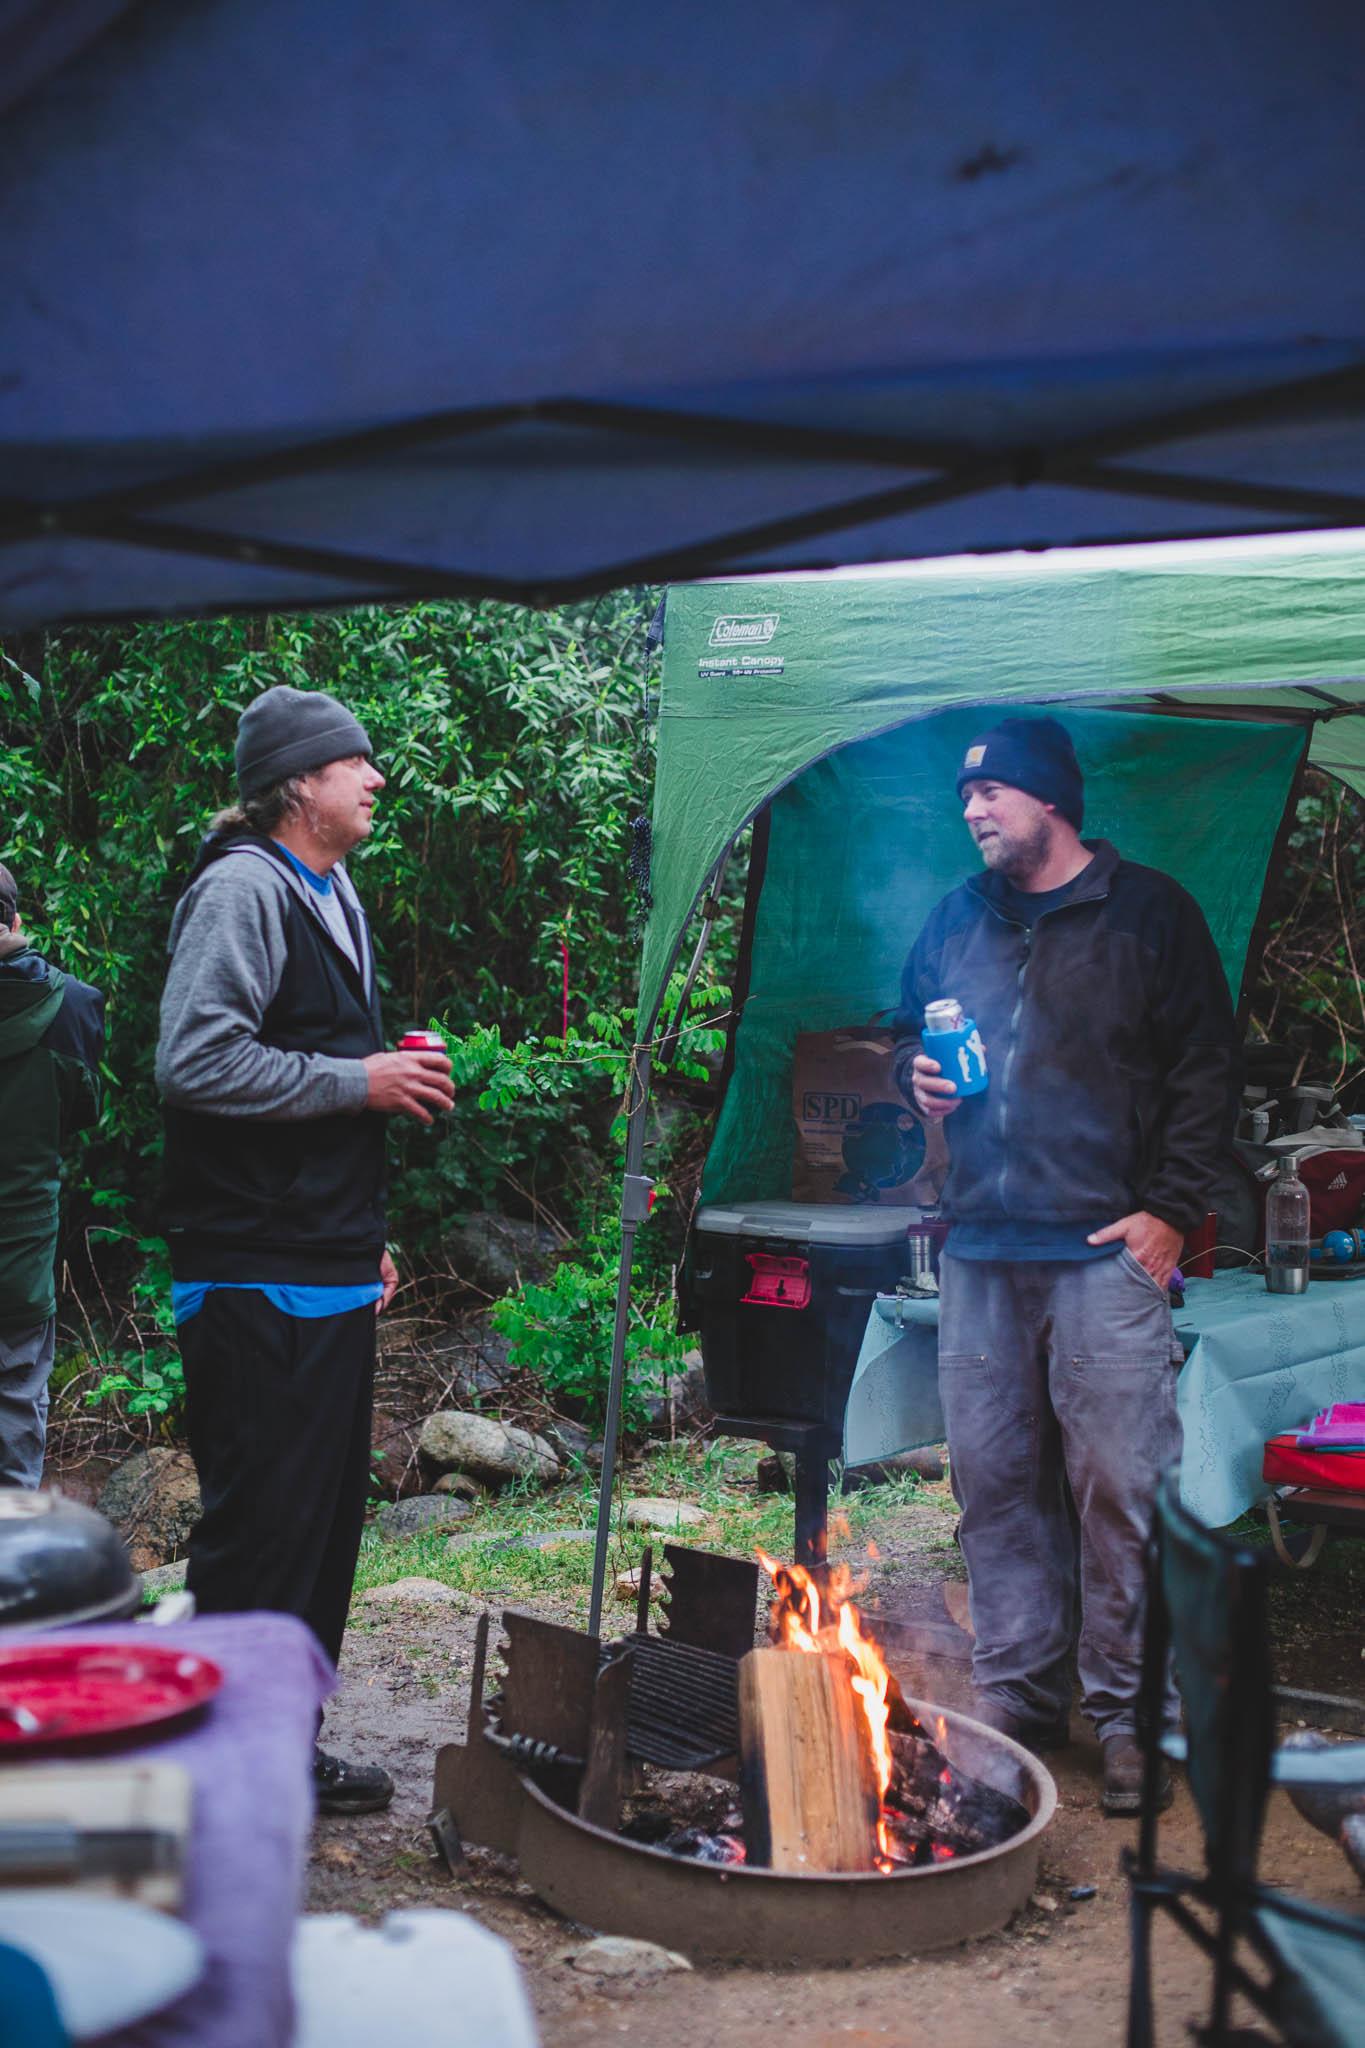 CampingintheRainLenkalandAll Rights Reserved-22.jpg